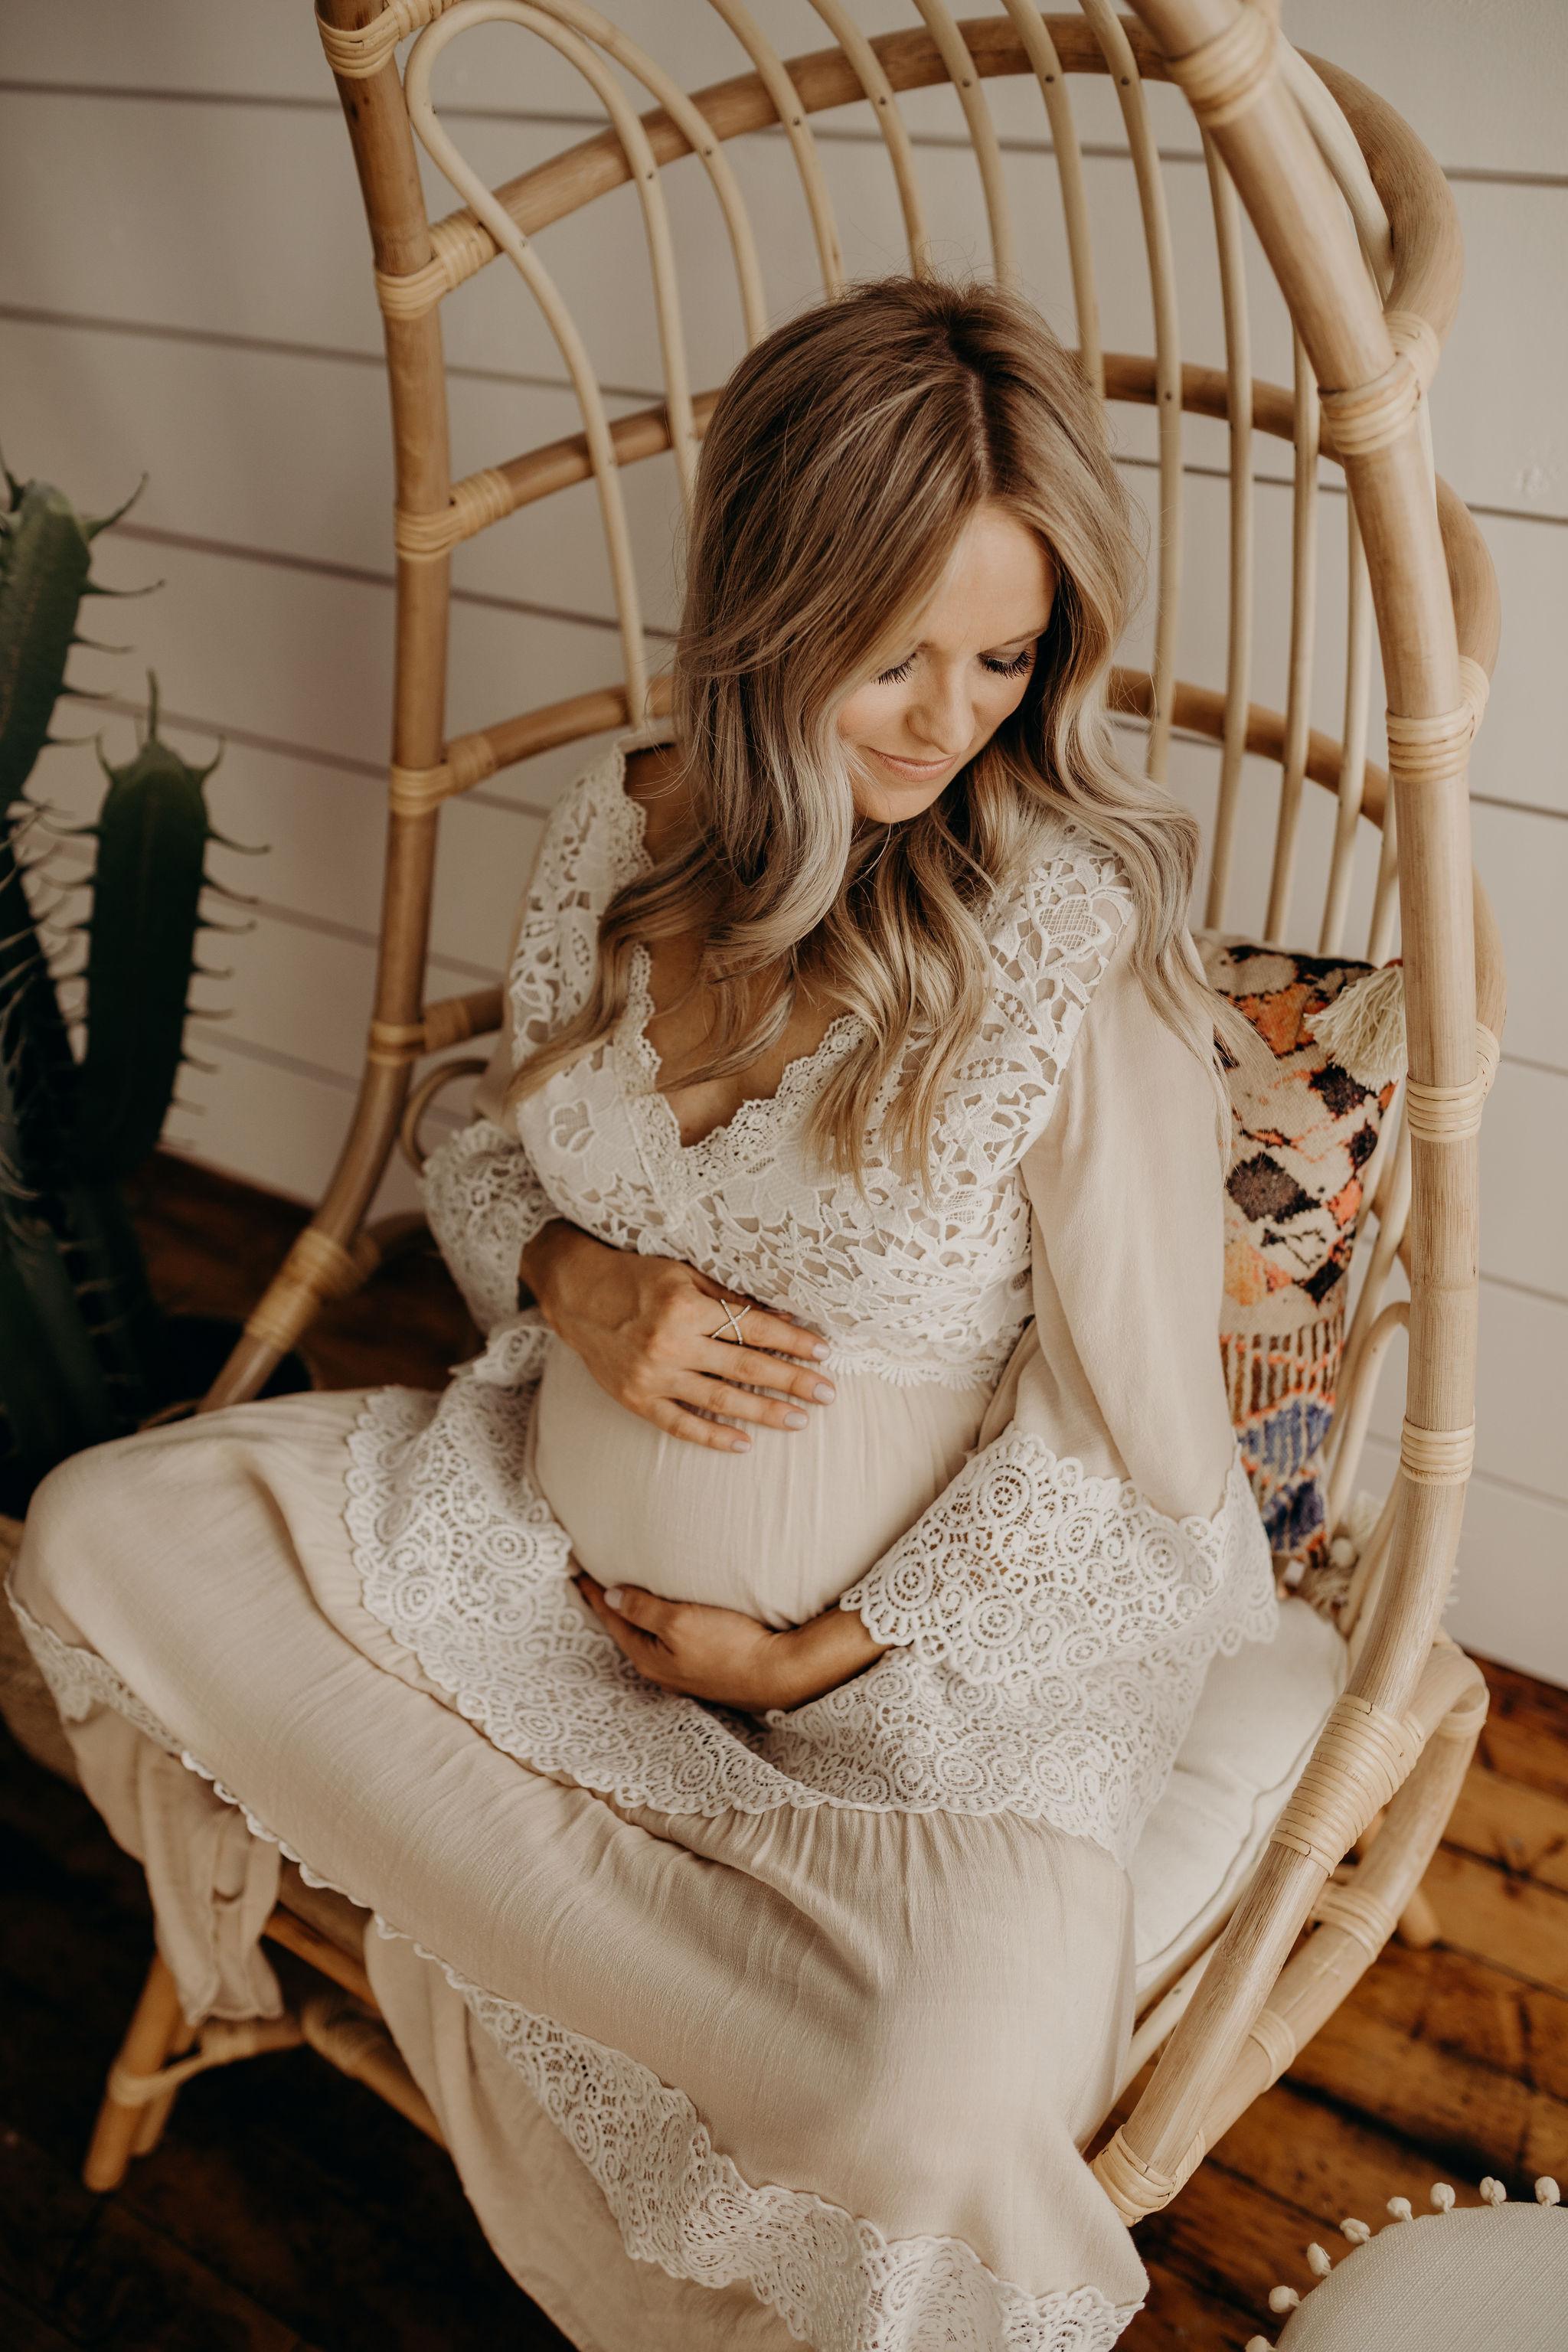 Katie-Posey-Maternity-Session-2018-Kansas-City-MO-Jesse-Salter-Photography-5.jpg